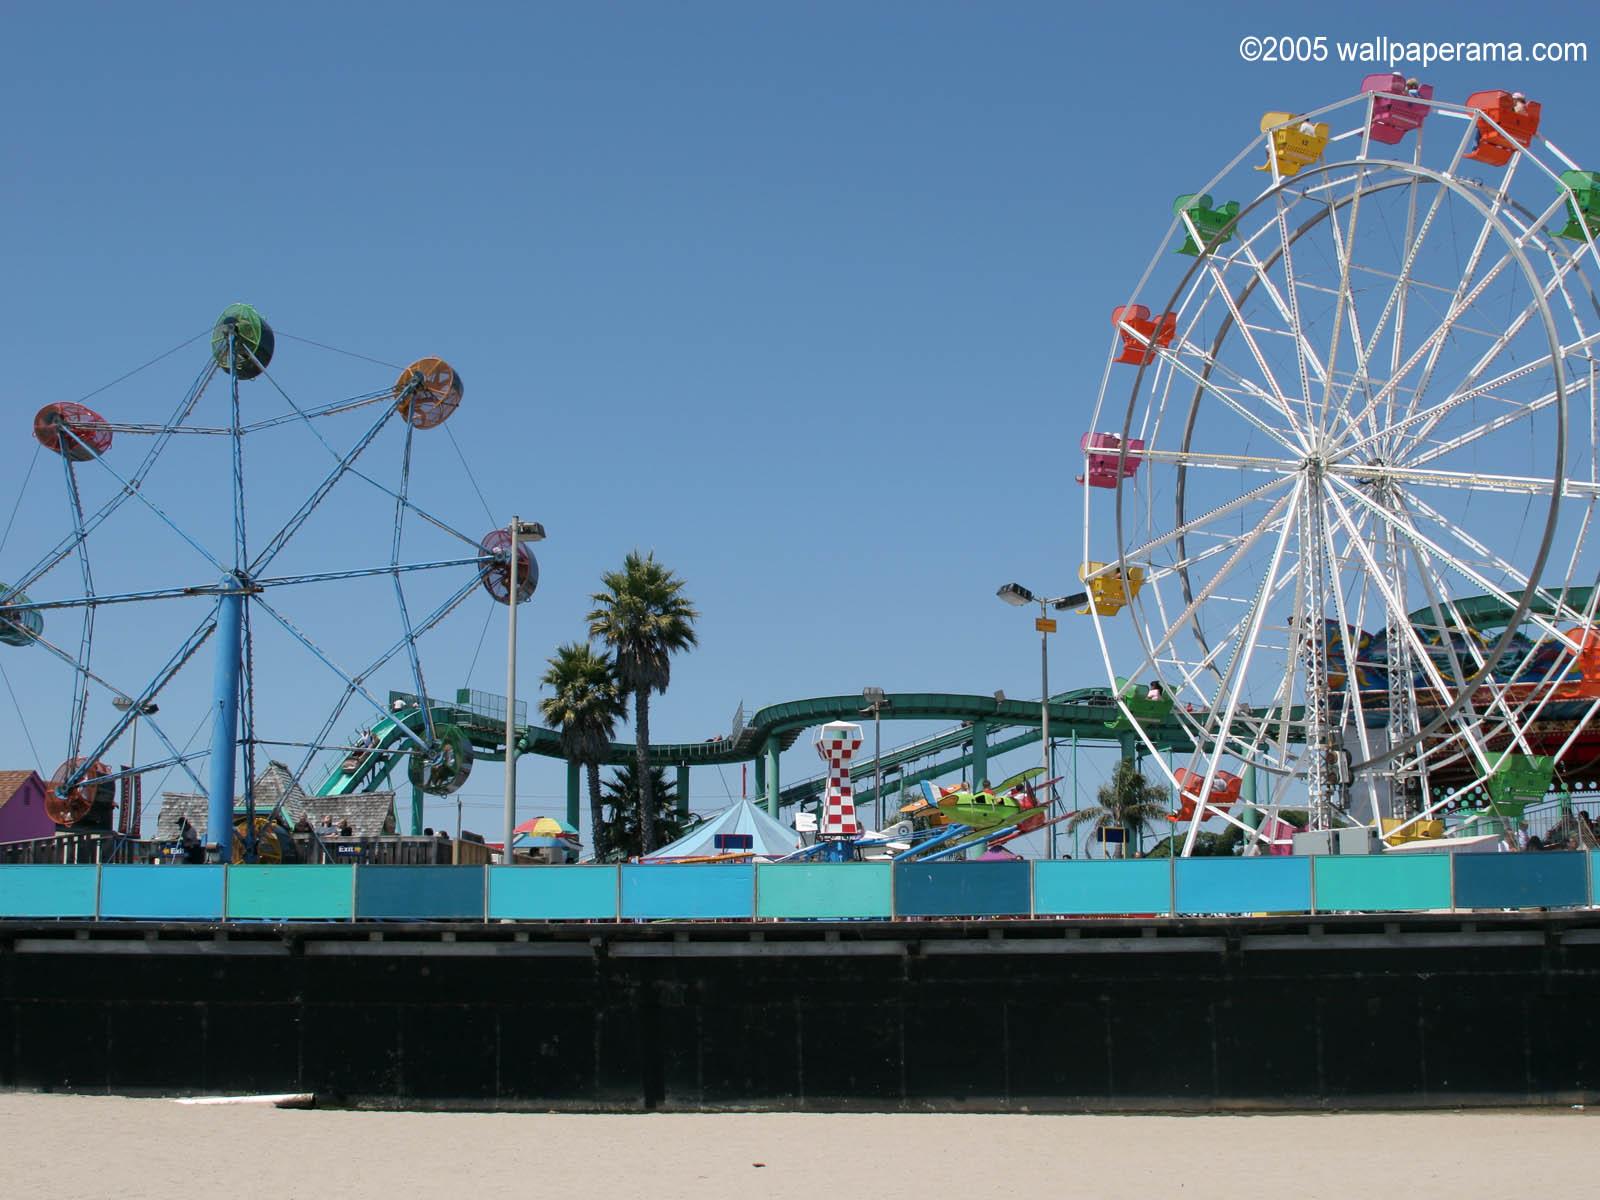 carnival boardwalk wallpaper free hd backgrounds images